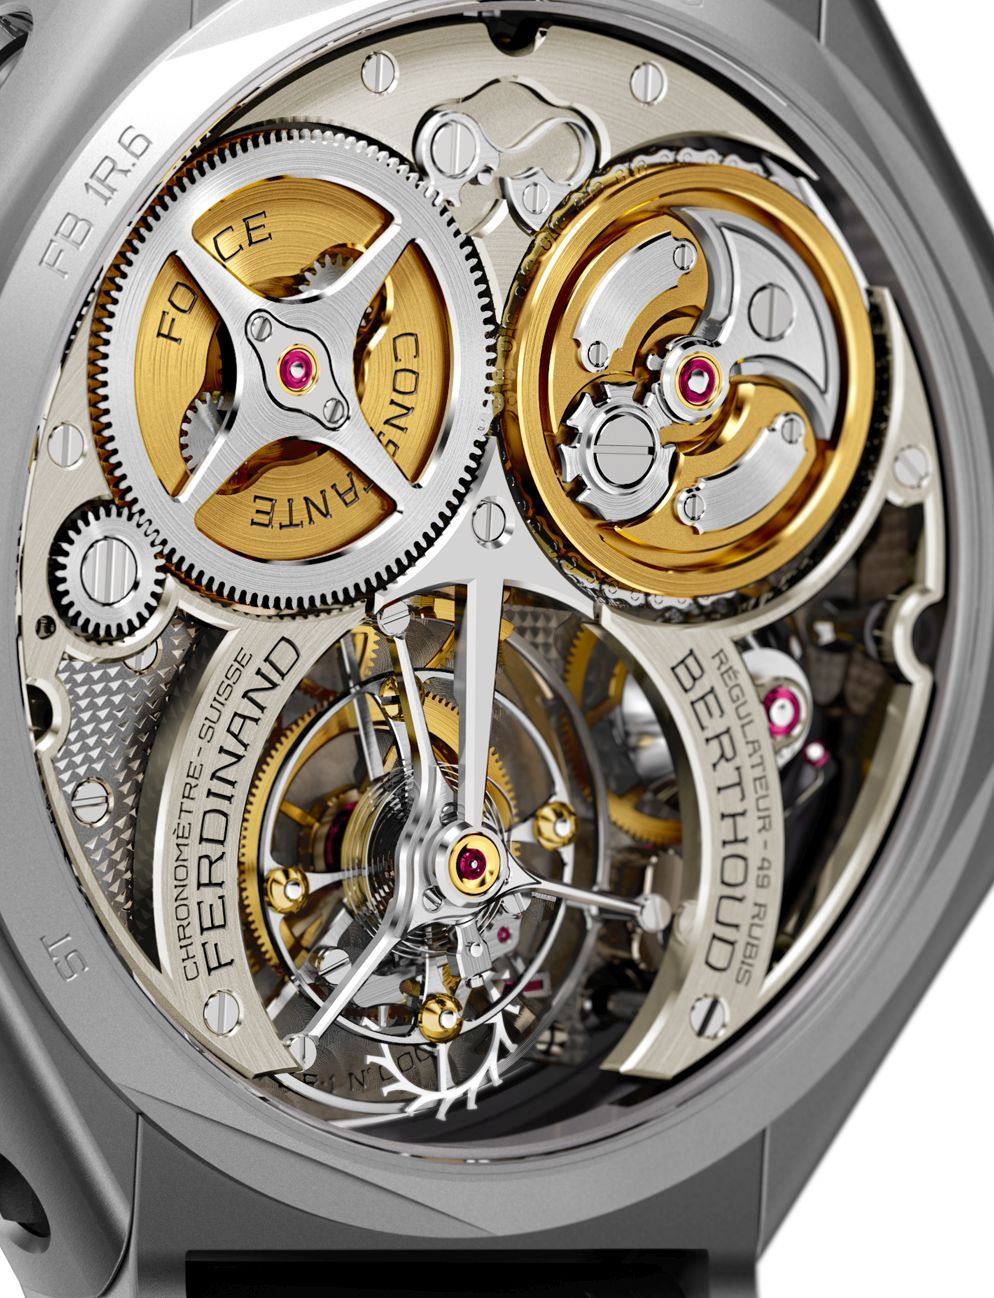 Chronometre Ferdinand Berthoud FB 1R.6-1 Regulator, FB 1R.6 Regulator, Berthoud FB 1R.6 Regulator, Berthoud FB 1R.6-1 Regulator, Berthoud Chronometer